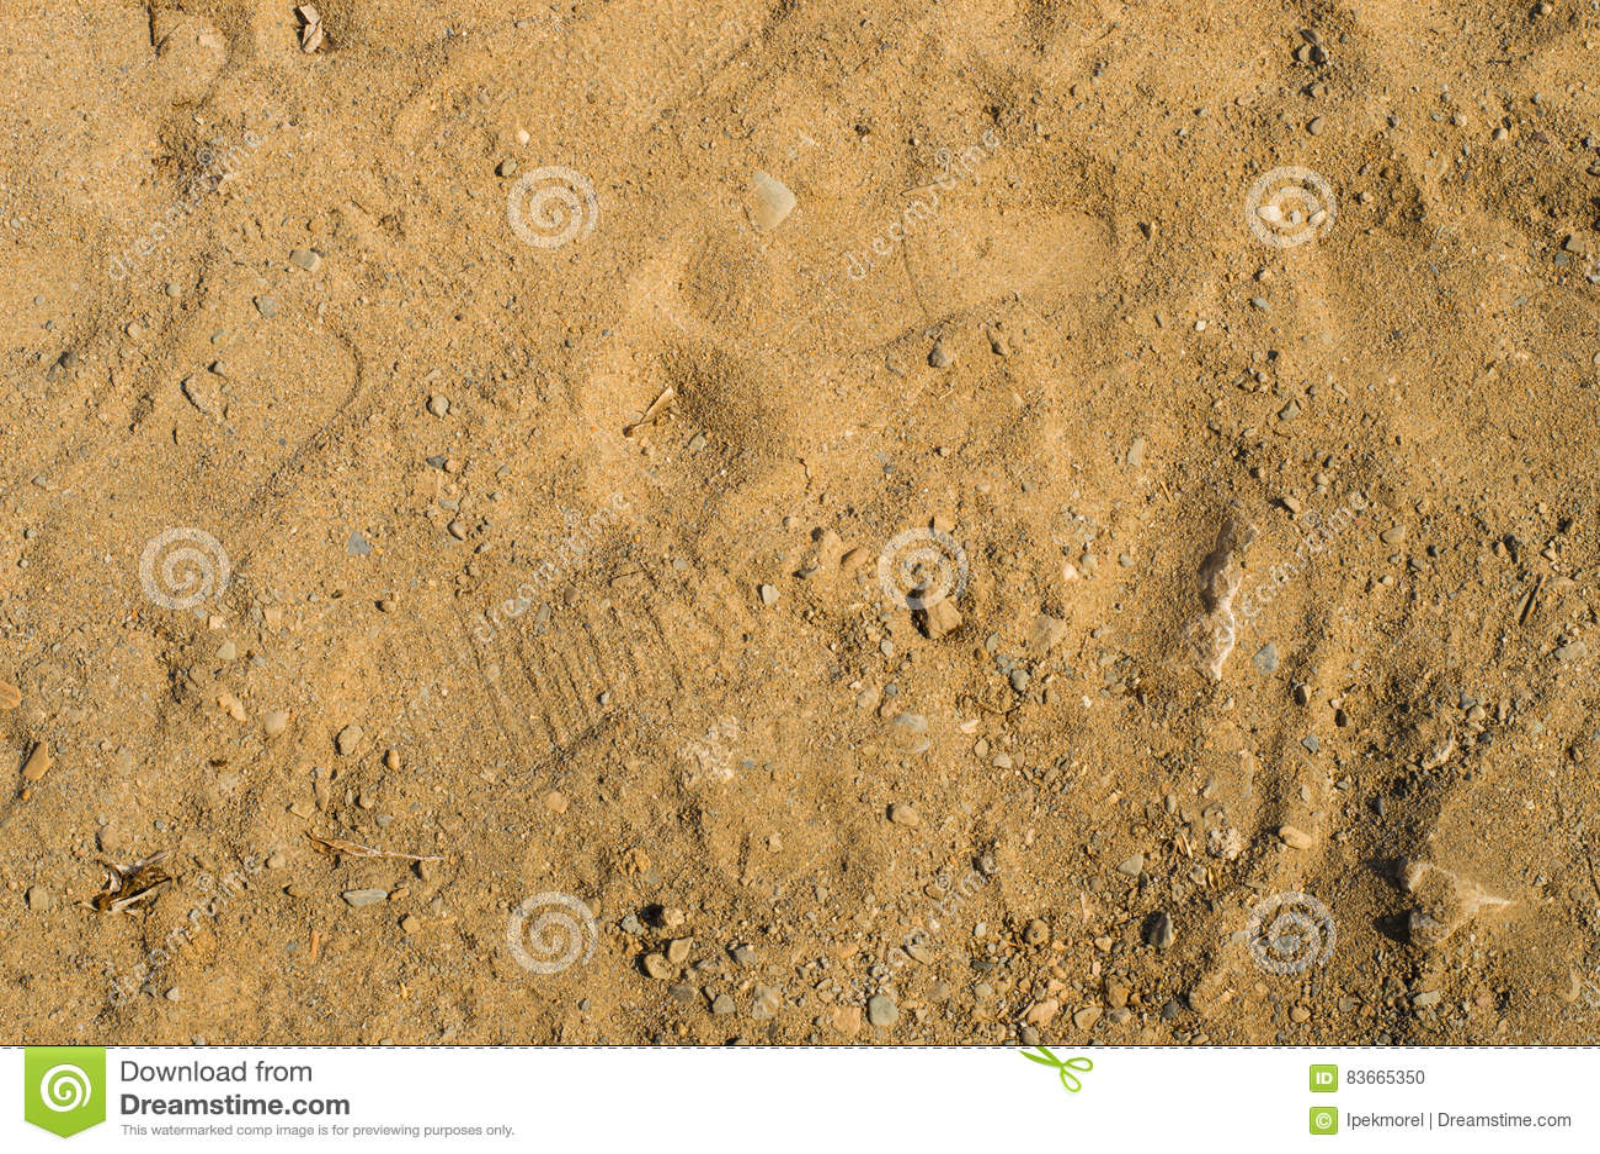 Крупный план на пляже фото фото 263-867